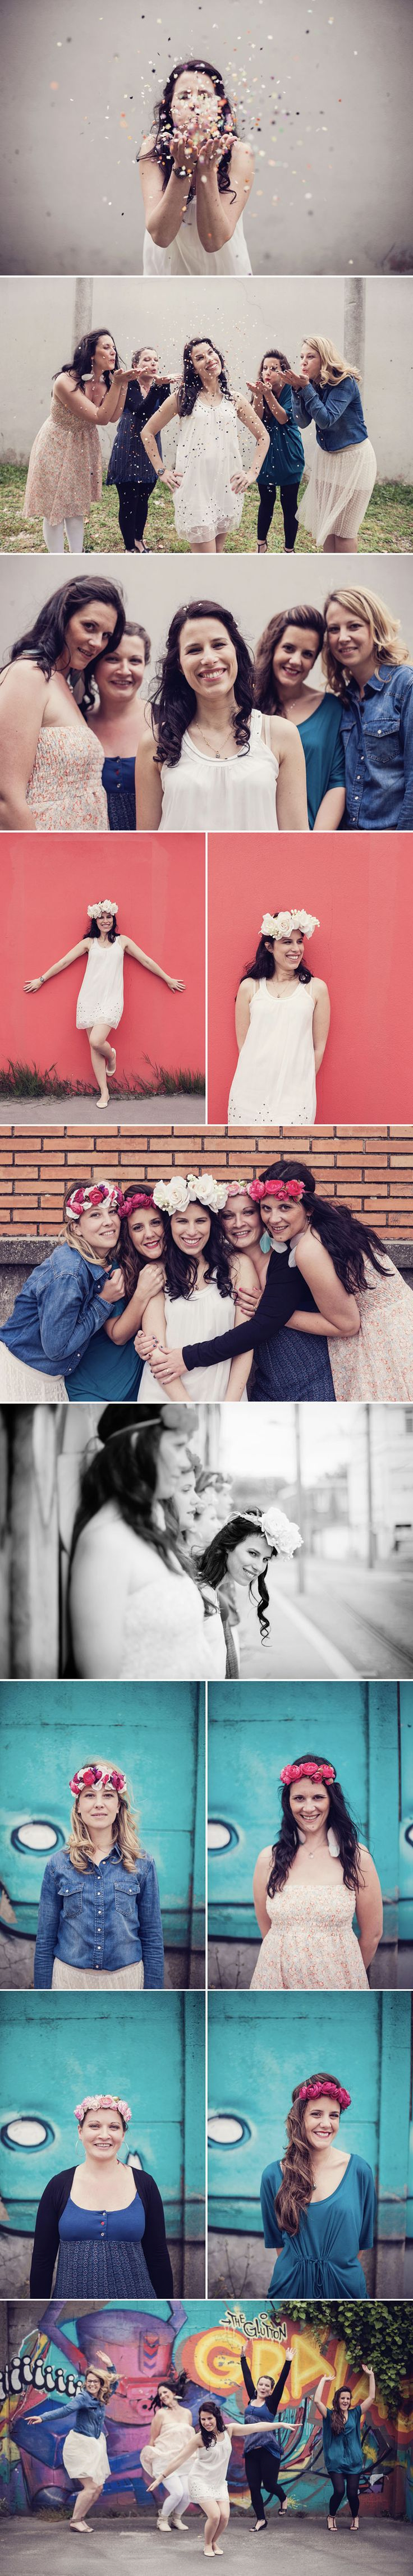 EVJF Emily // Séance photo EVJF // Sarah Miramon Photographe   #evjf #filles #confettis #lifesyle #photo #photographe #bordeaux